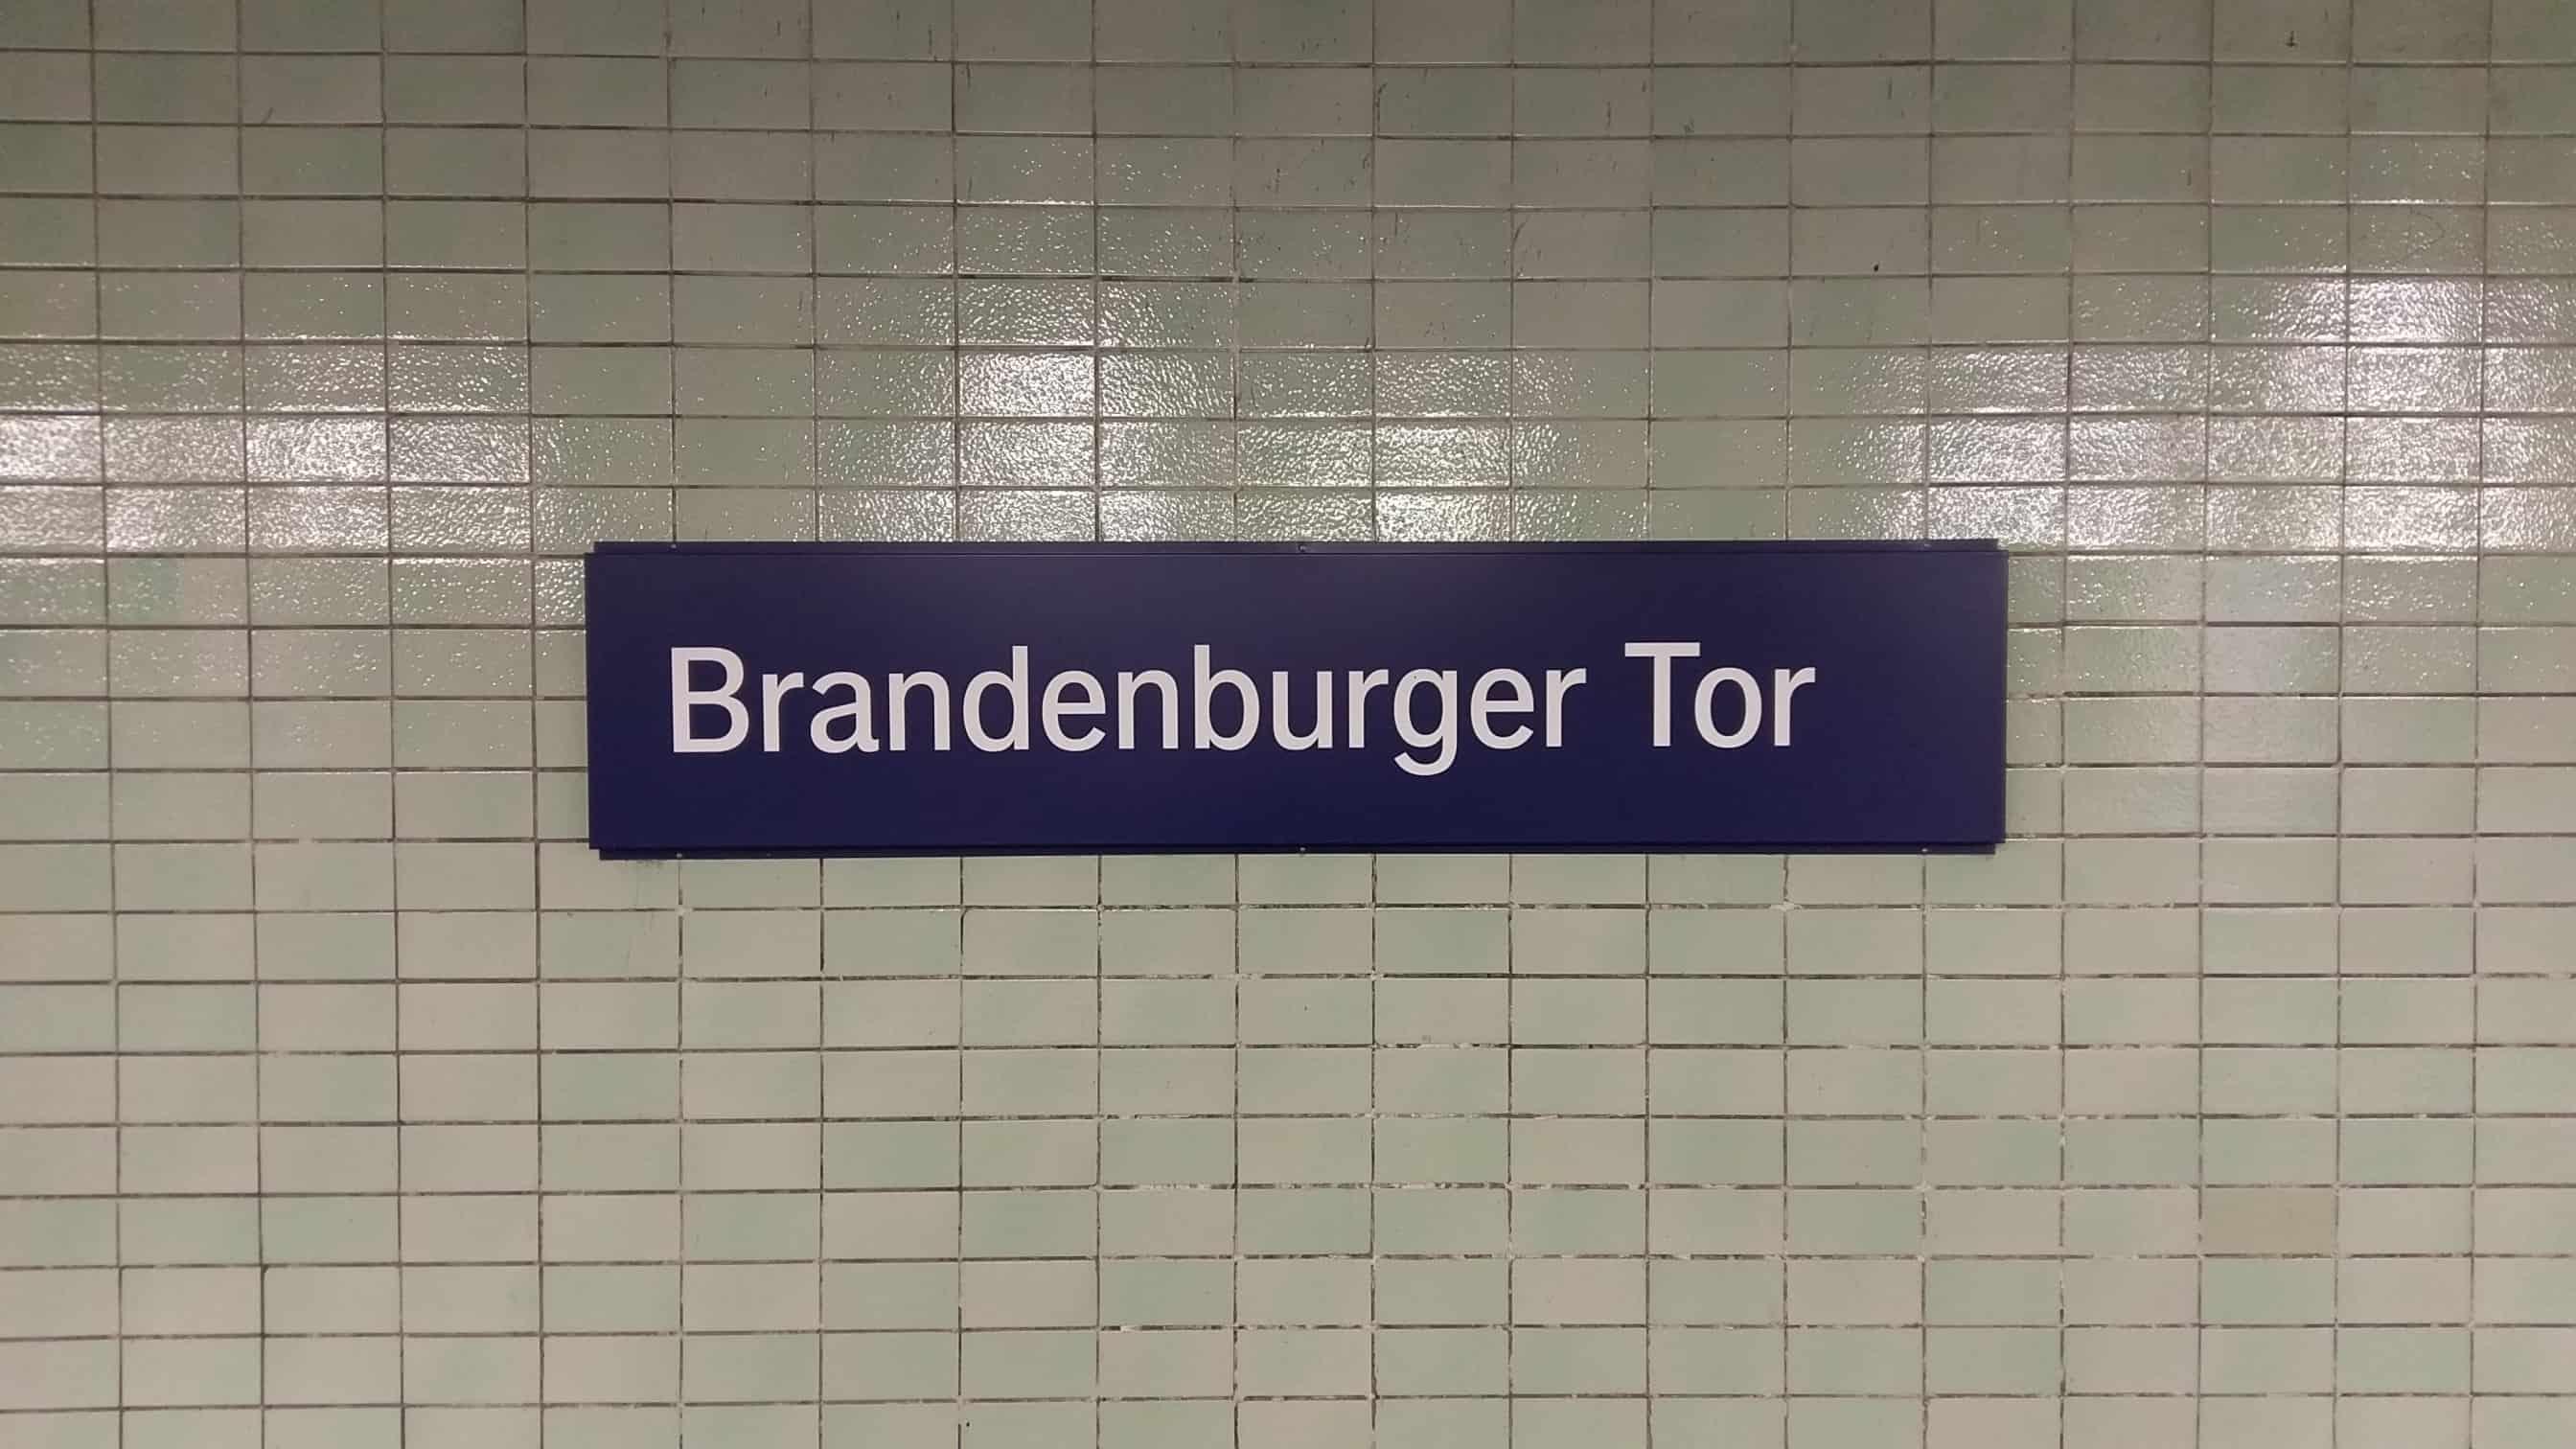 metrohalte Brandenburger Tor